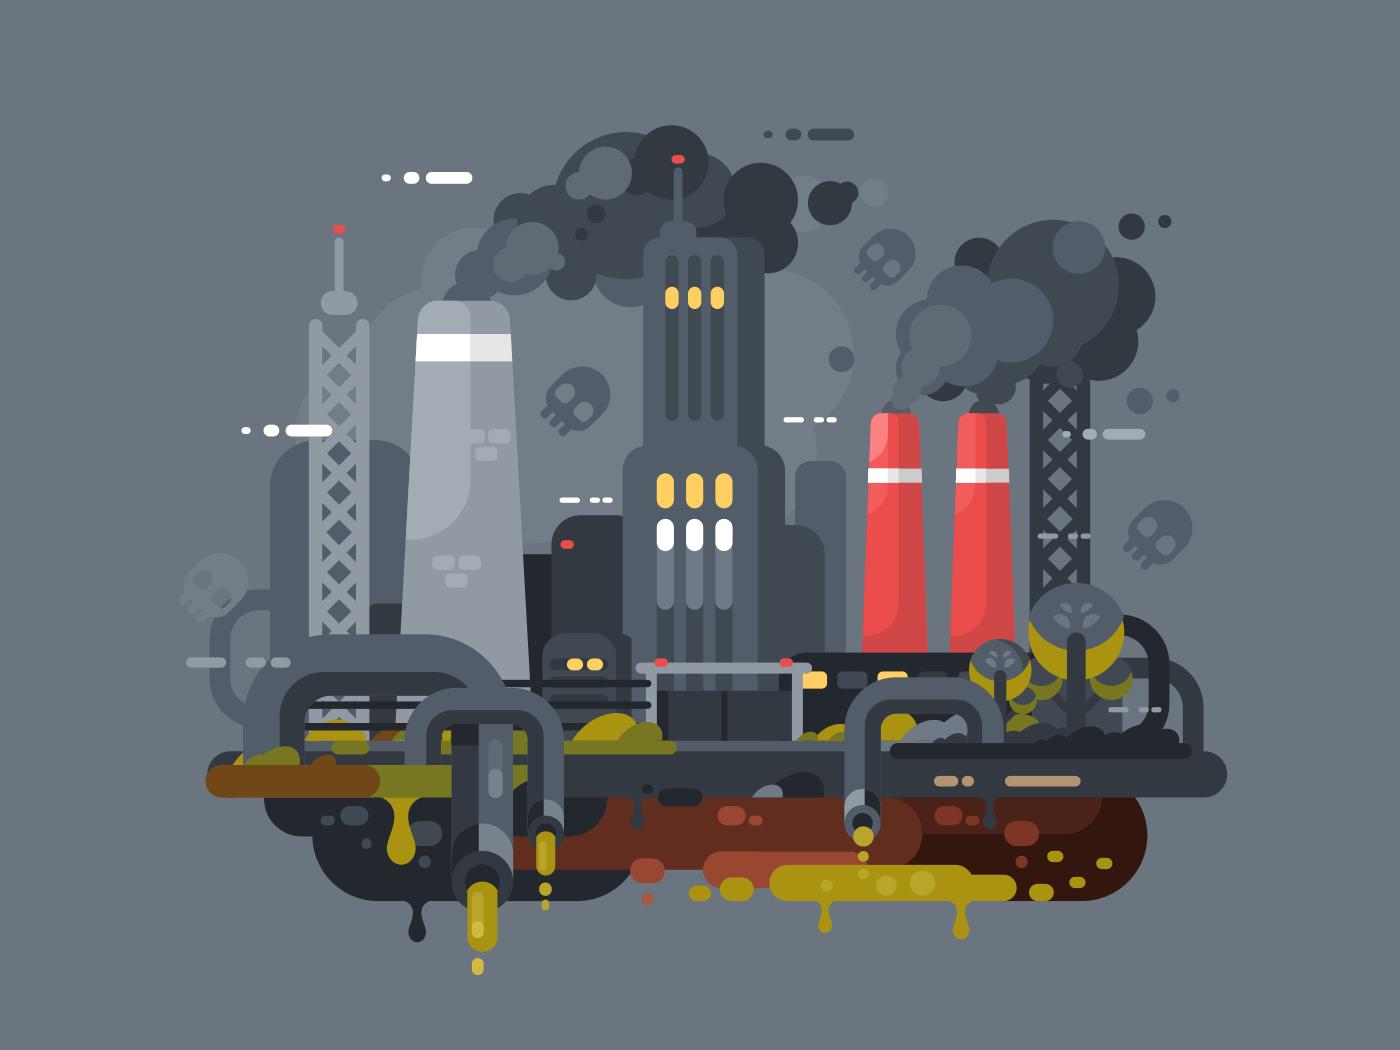 Factories polluting environment flat vector illustration